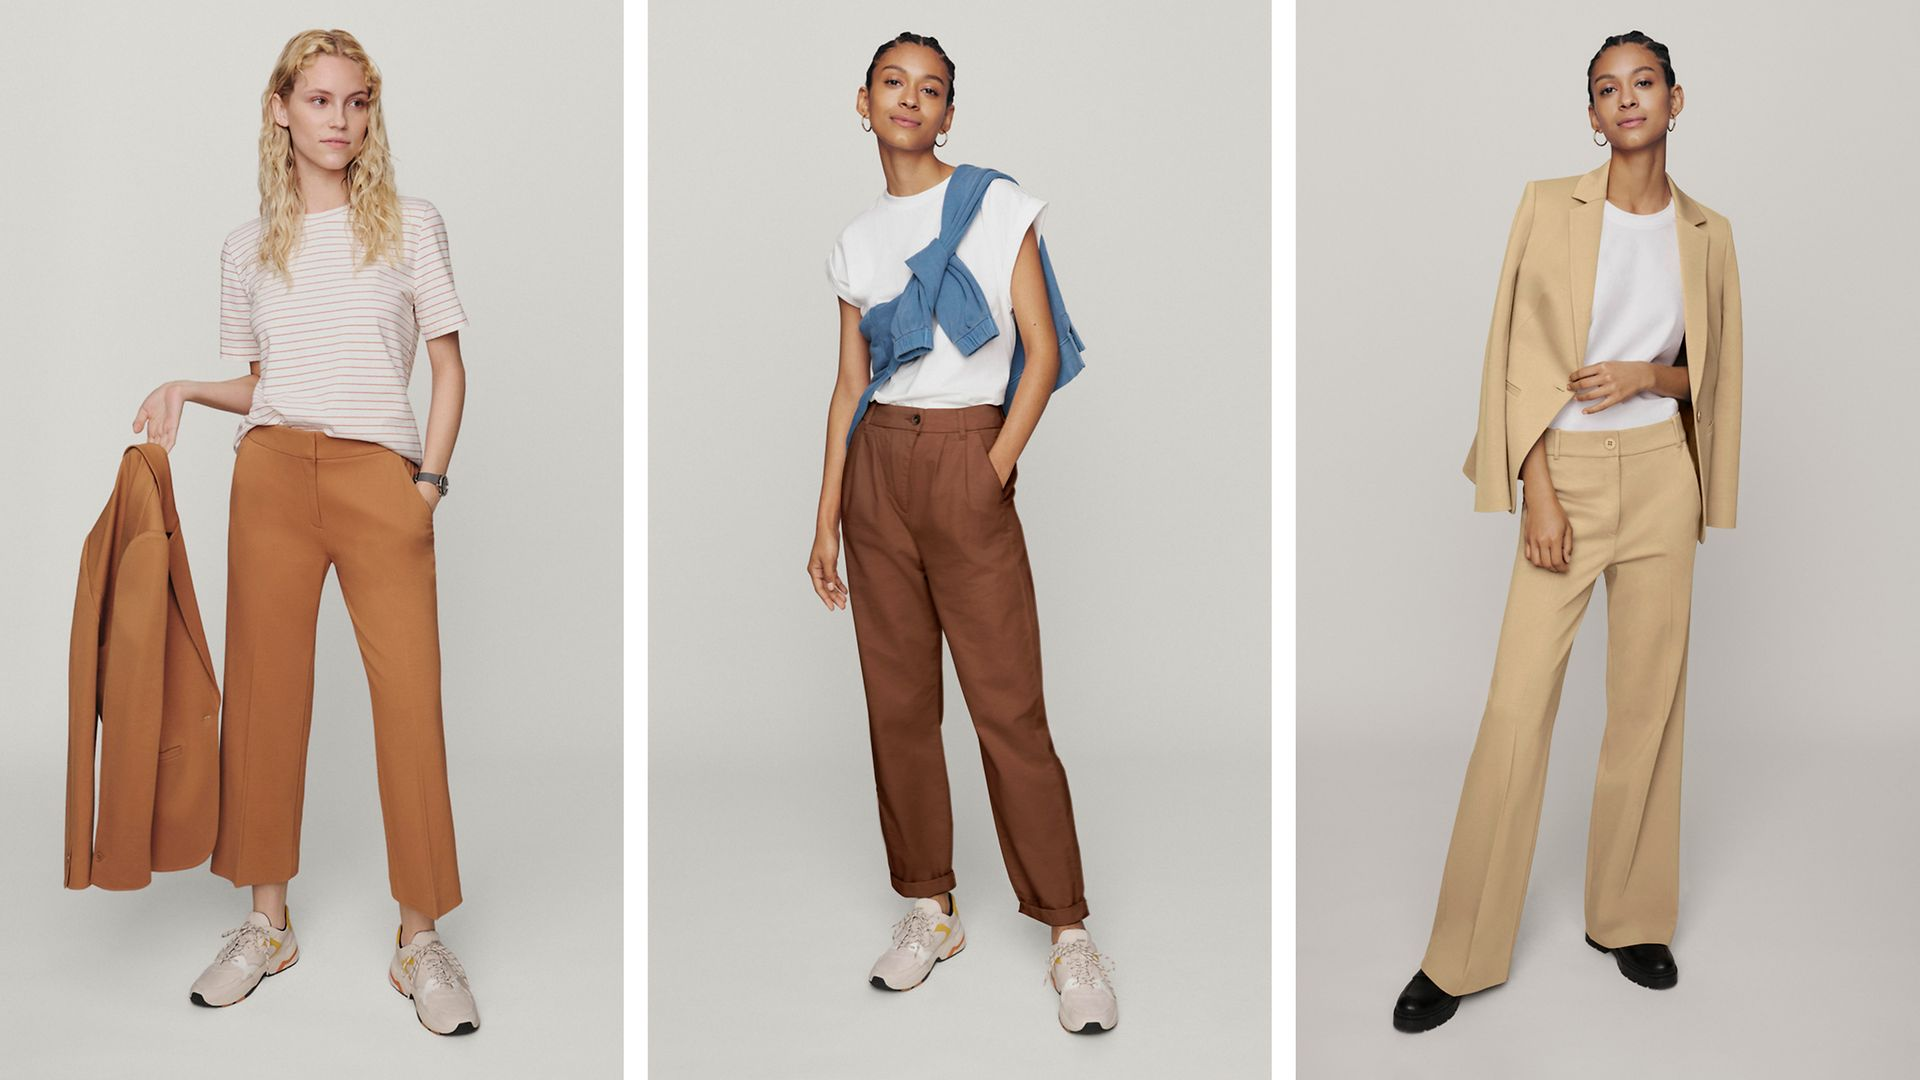 072021 - Women - Inspiration - Lookbook - Simply perfect pants - Hero Large 1 IMG